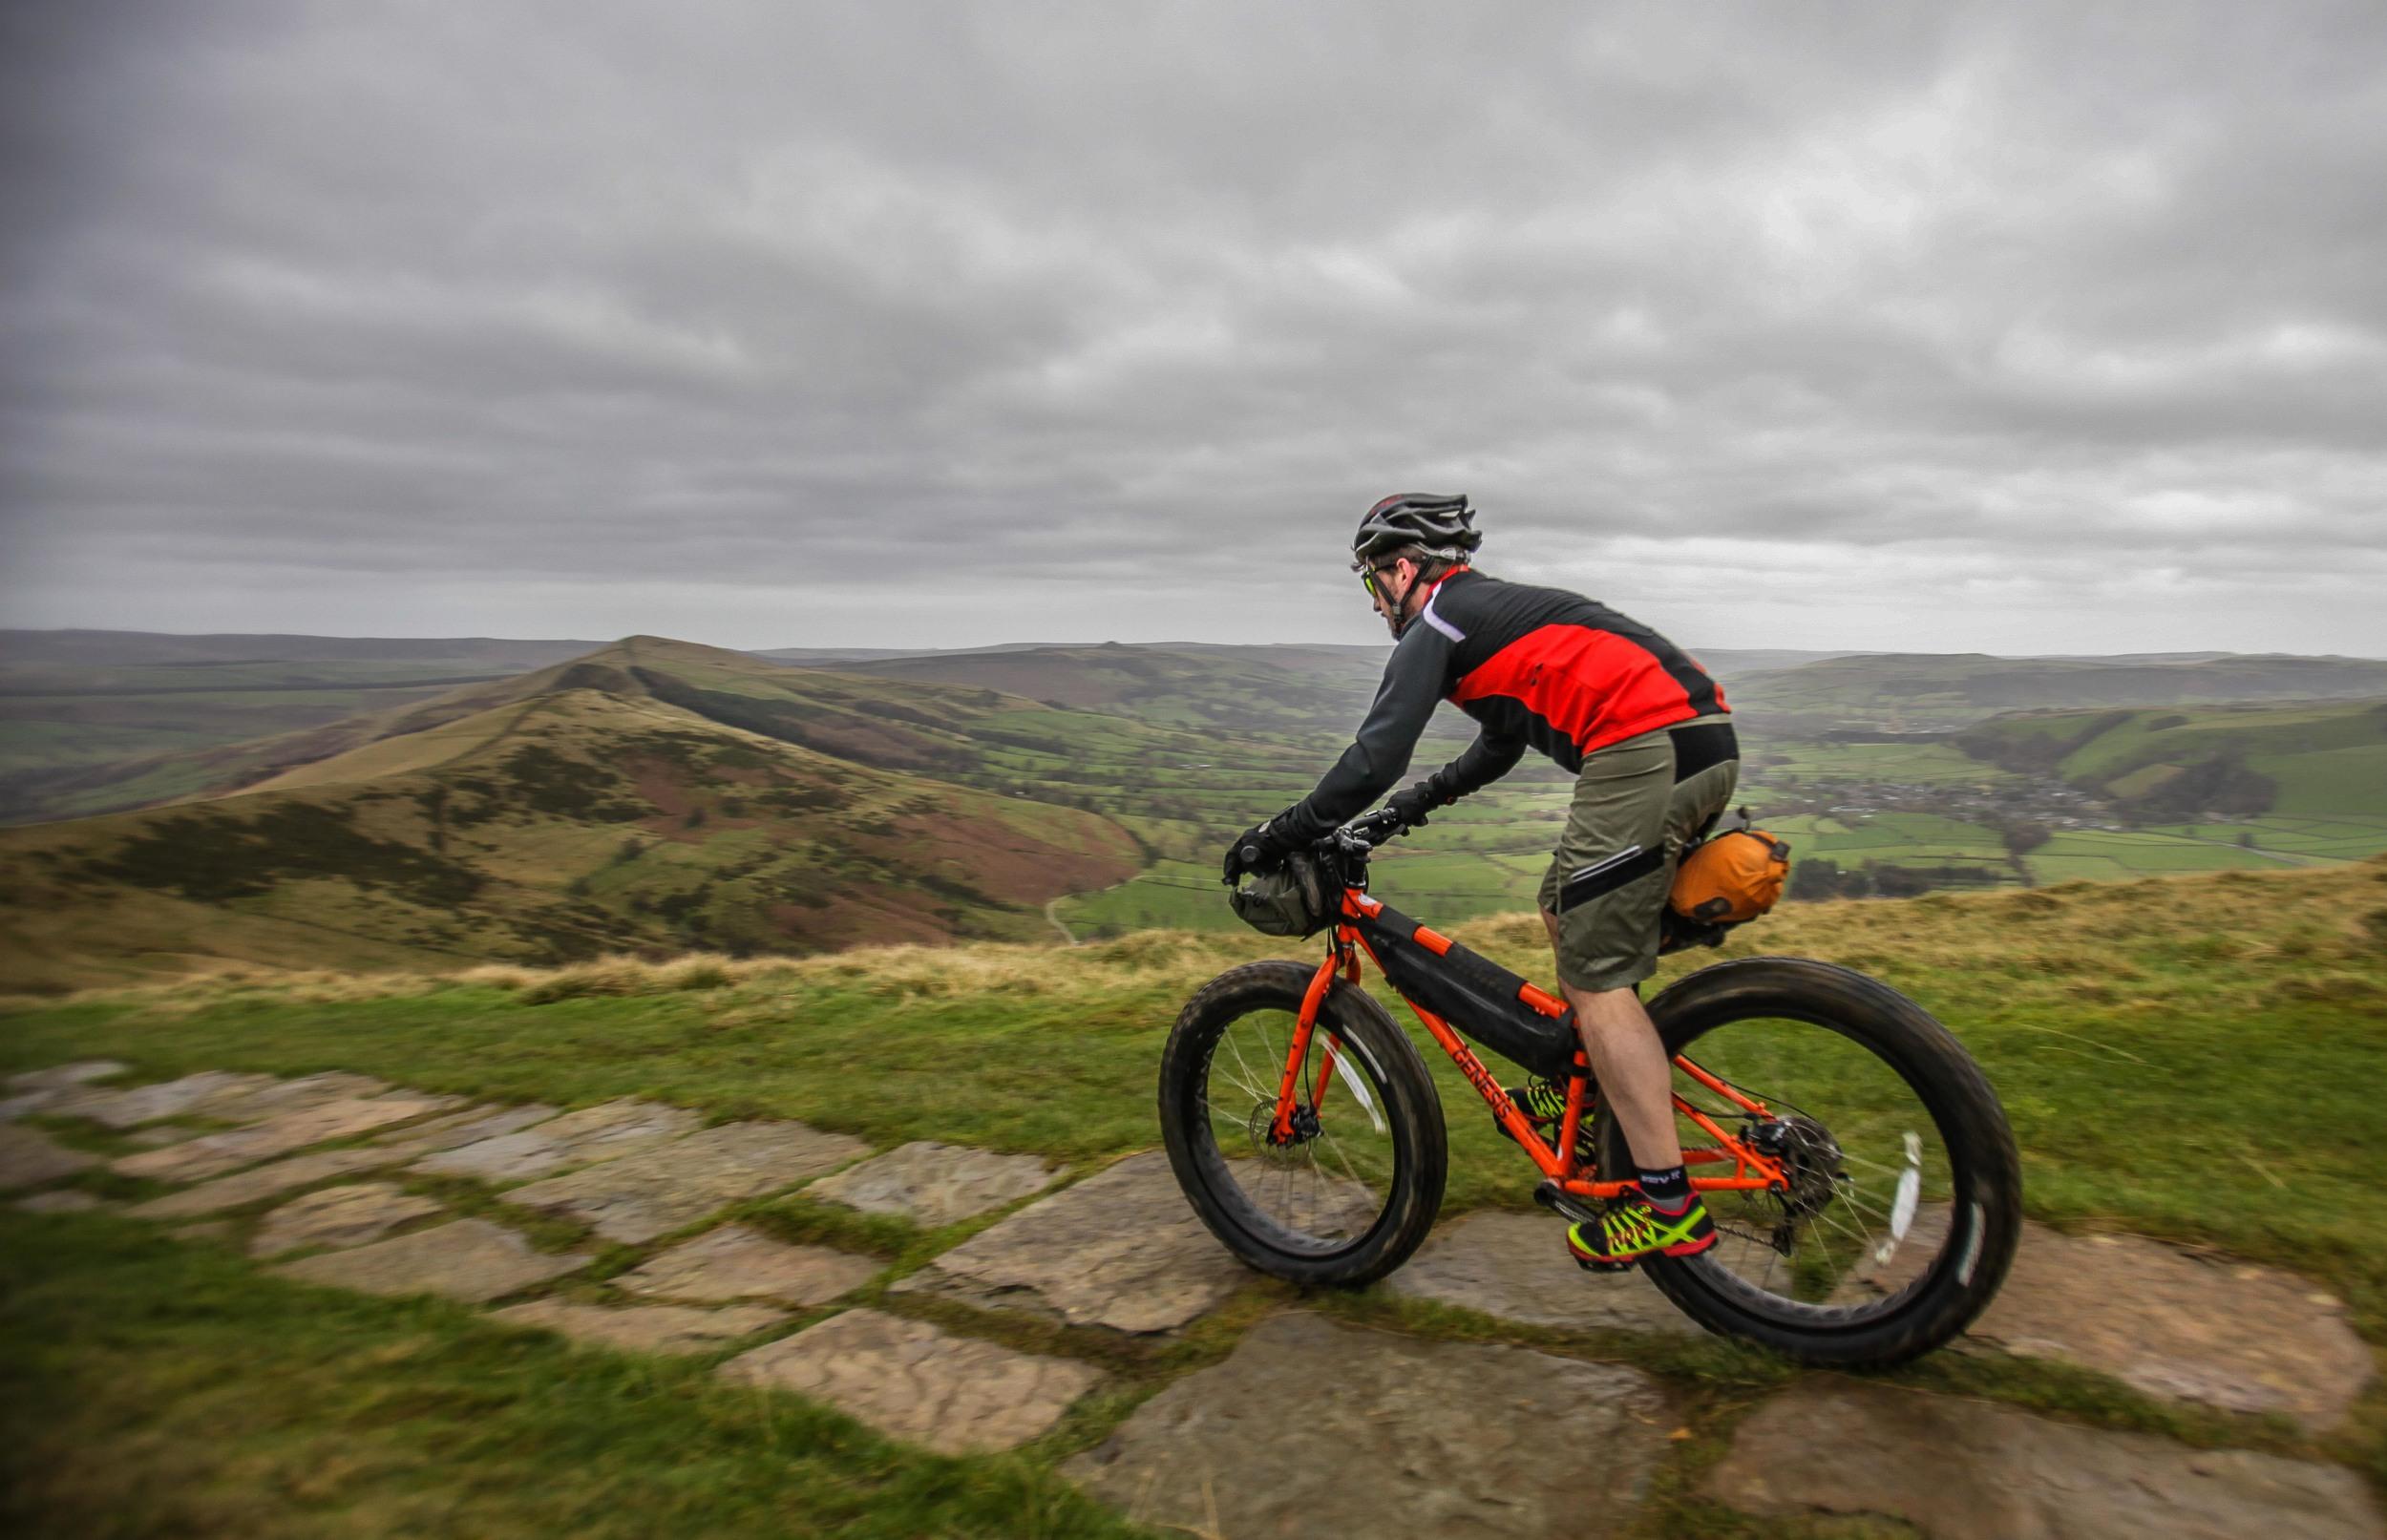 Great British MINI Adventure Day 2 - Fat Biking around Mam Tor in the Peak District